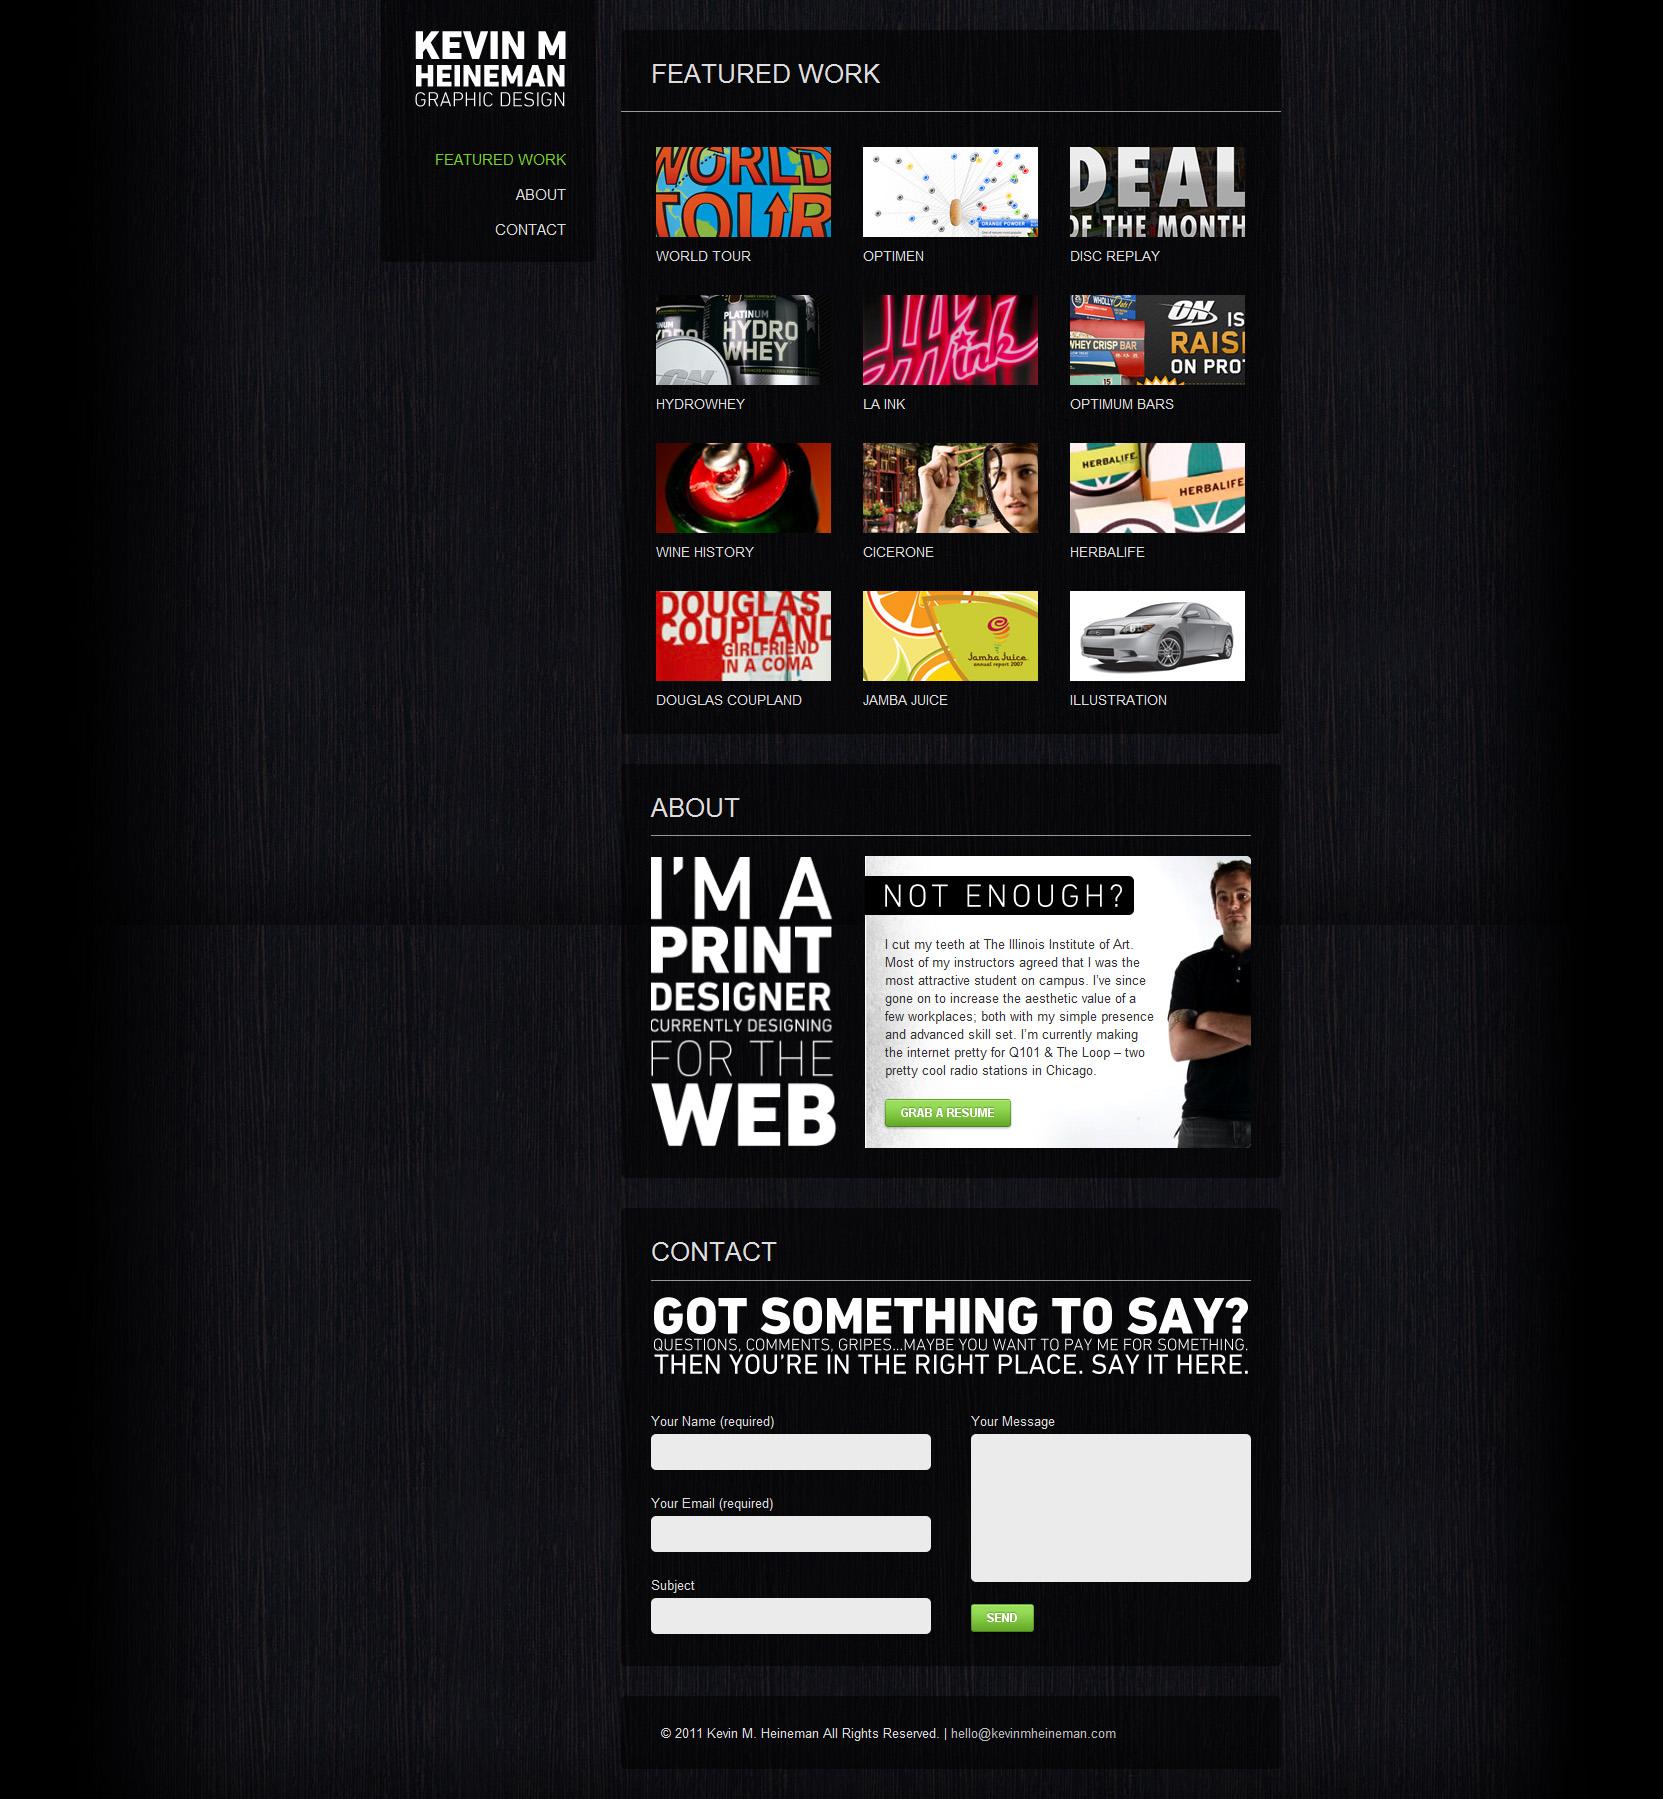 Kevin M. Heineman Website Screenshot